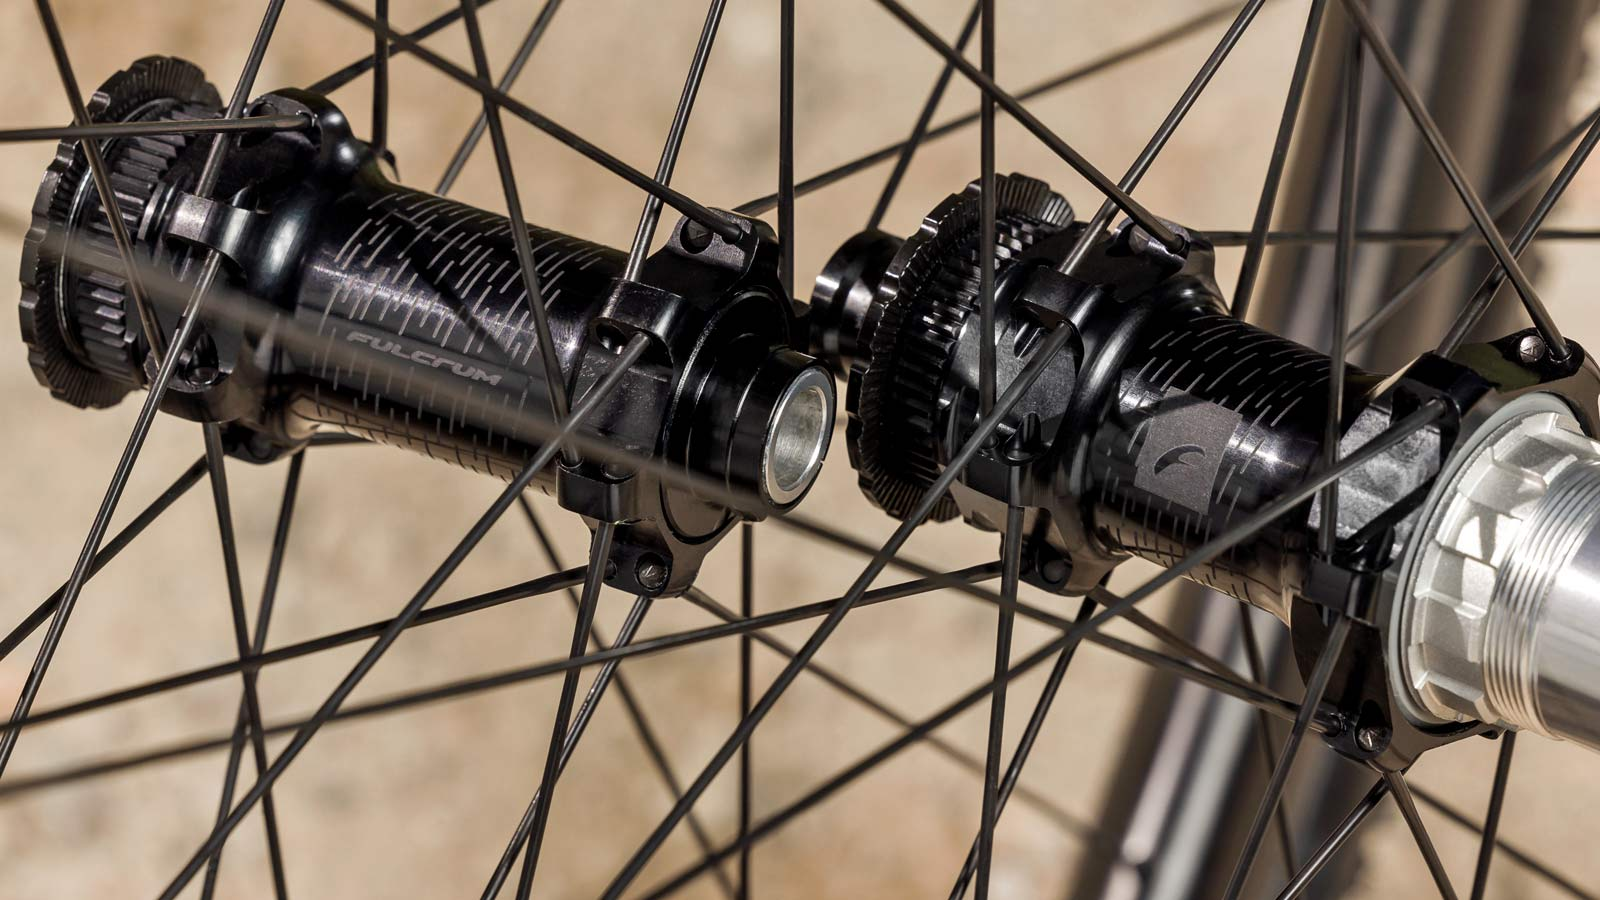 Fulcrum Rapid Red Carbon lightweight asymmetric tubeless gravel bike wheels,alloy hubs